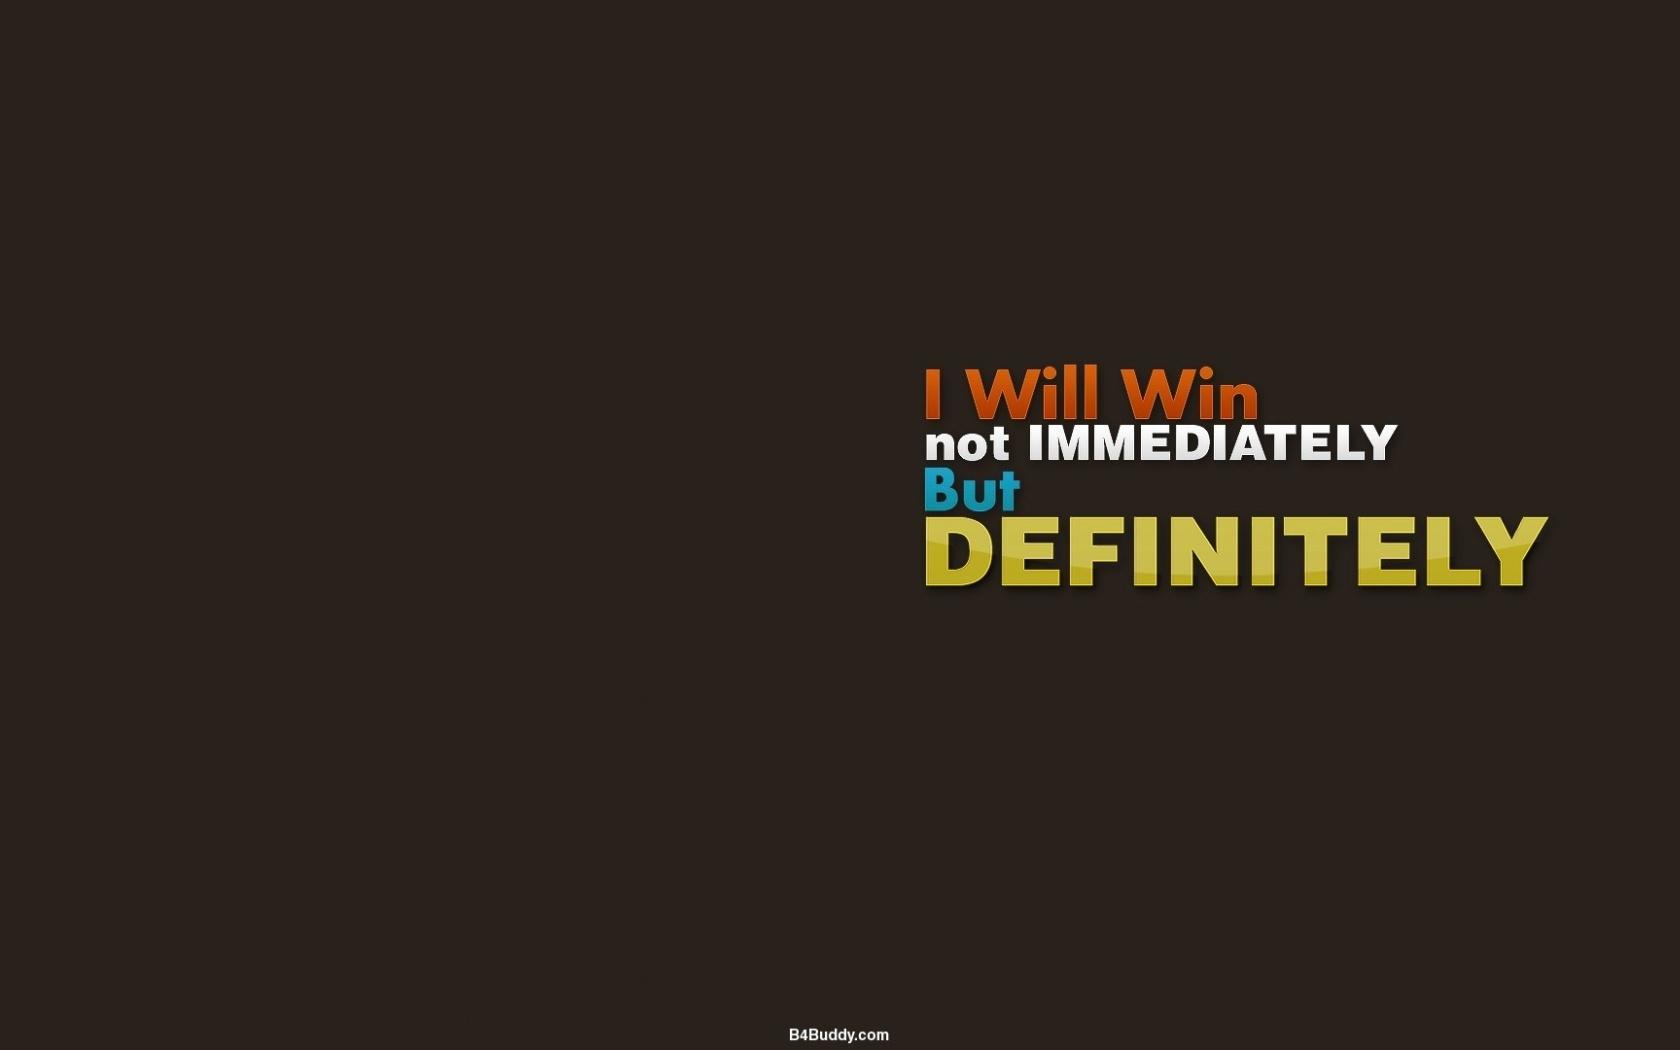 inspirational quotes wallpaper hd wallpapersafari